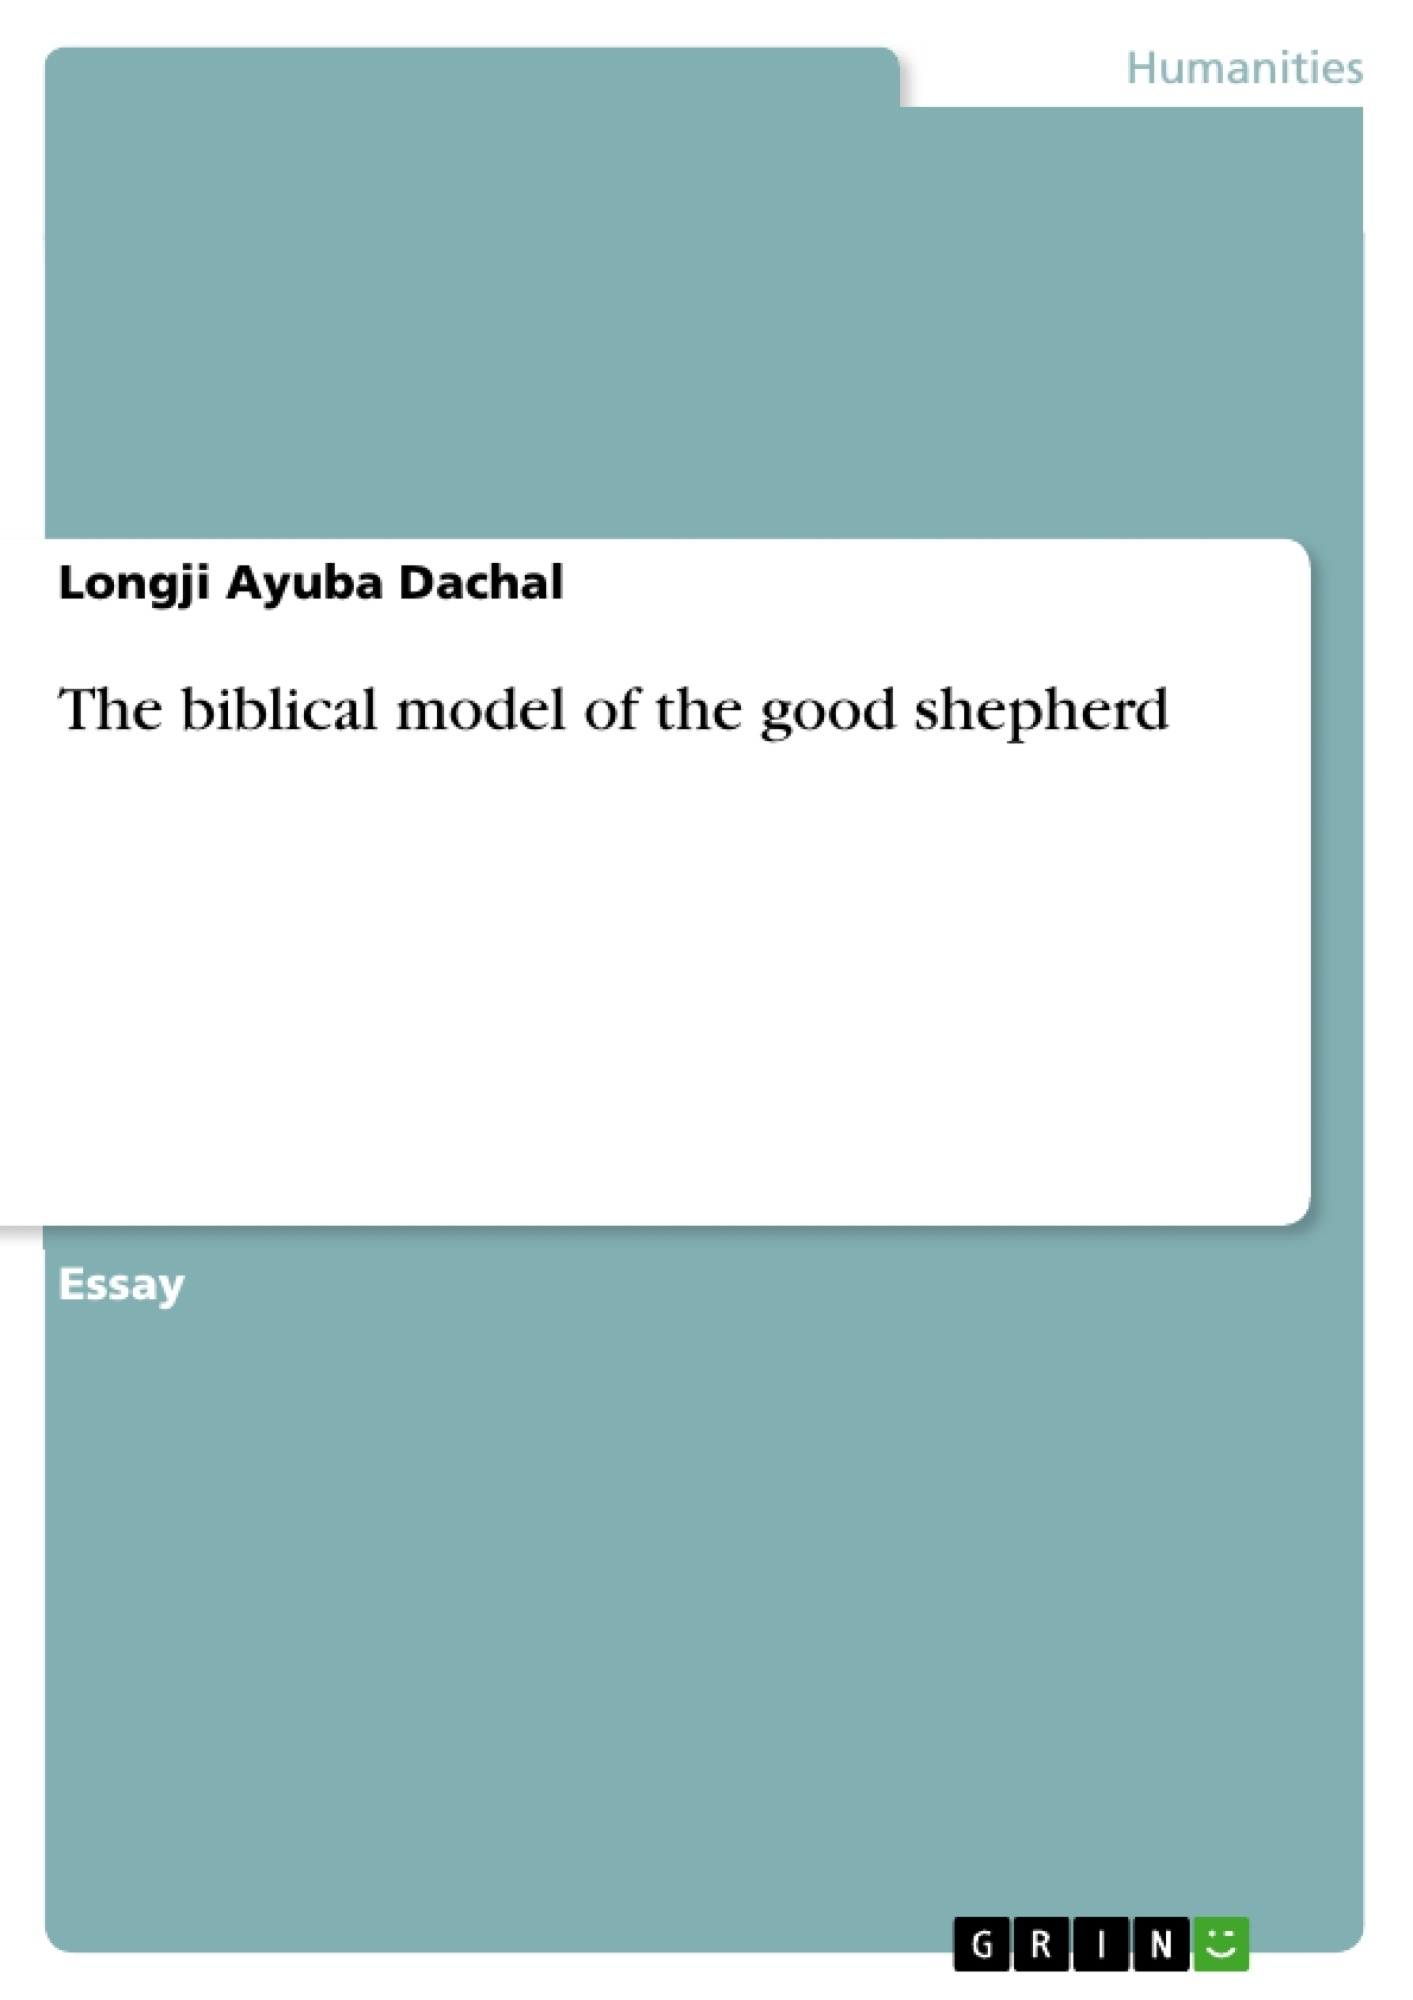 Title: The biblical model of the good shepherd